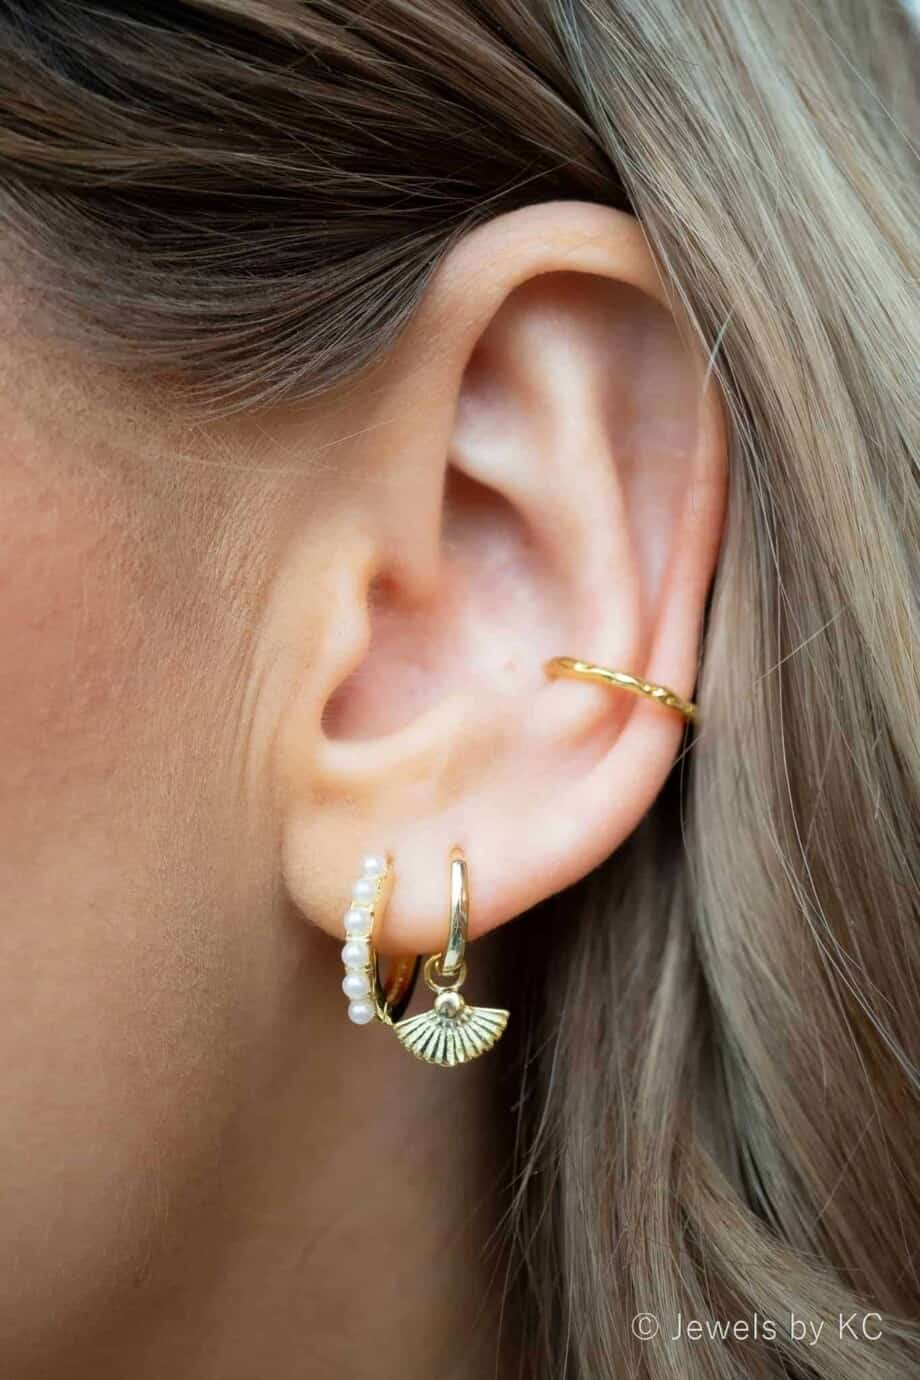 WS-EC-20033-Gouden ear cuff 'Narrow beauty' van Goud op Zilver